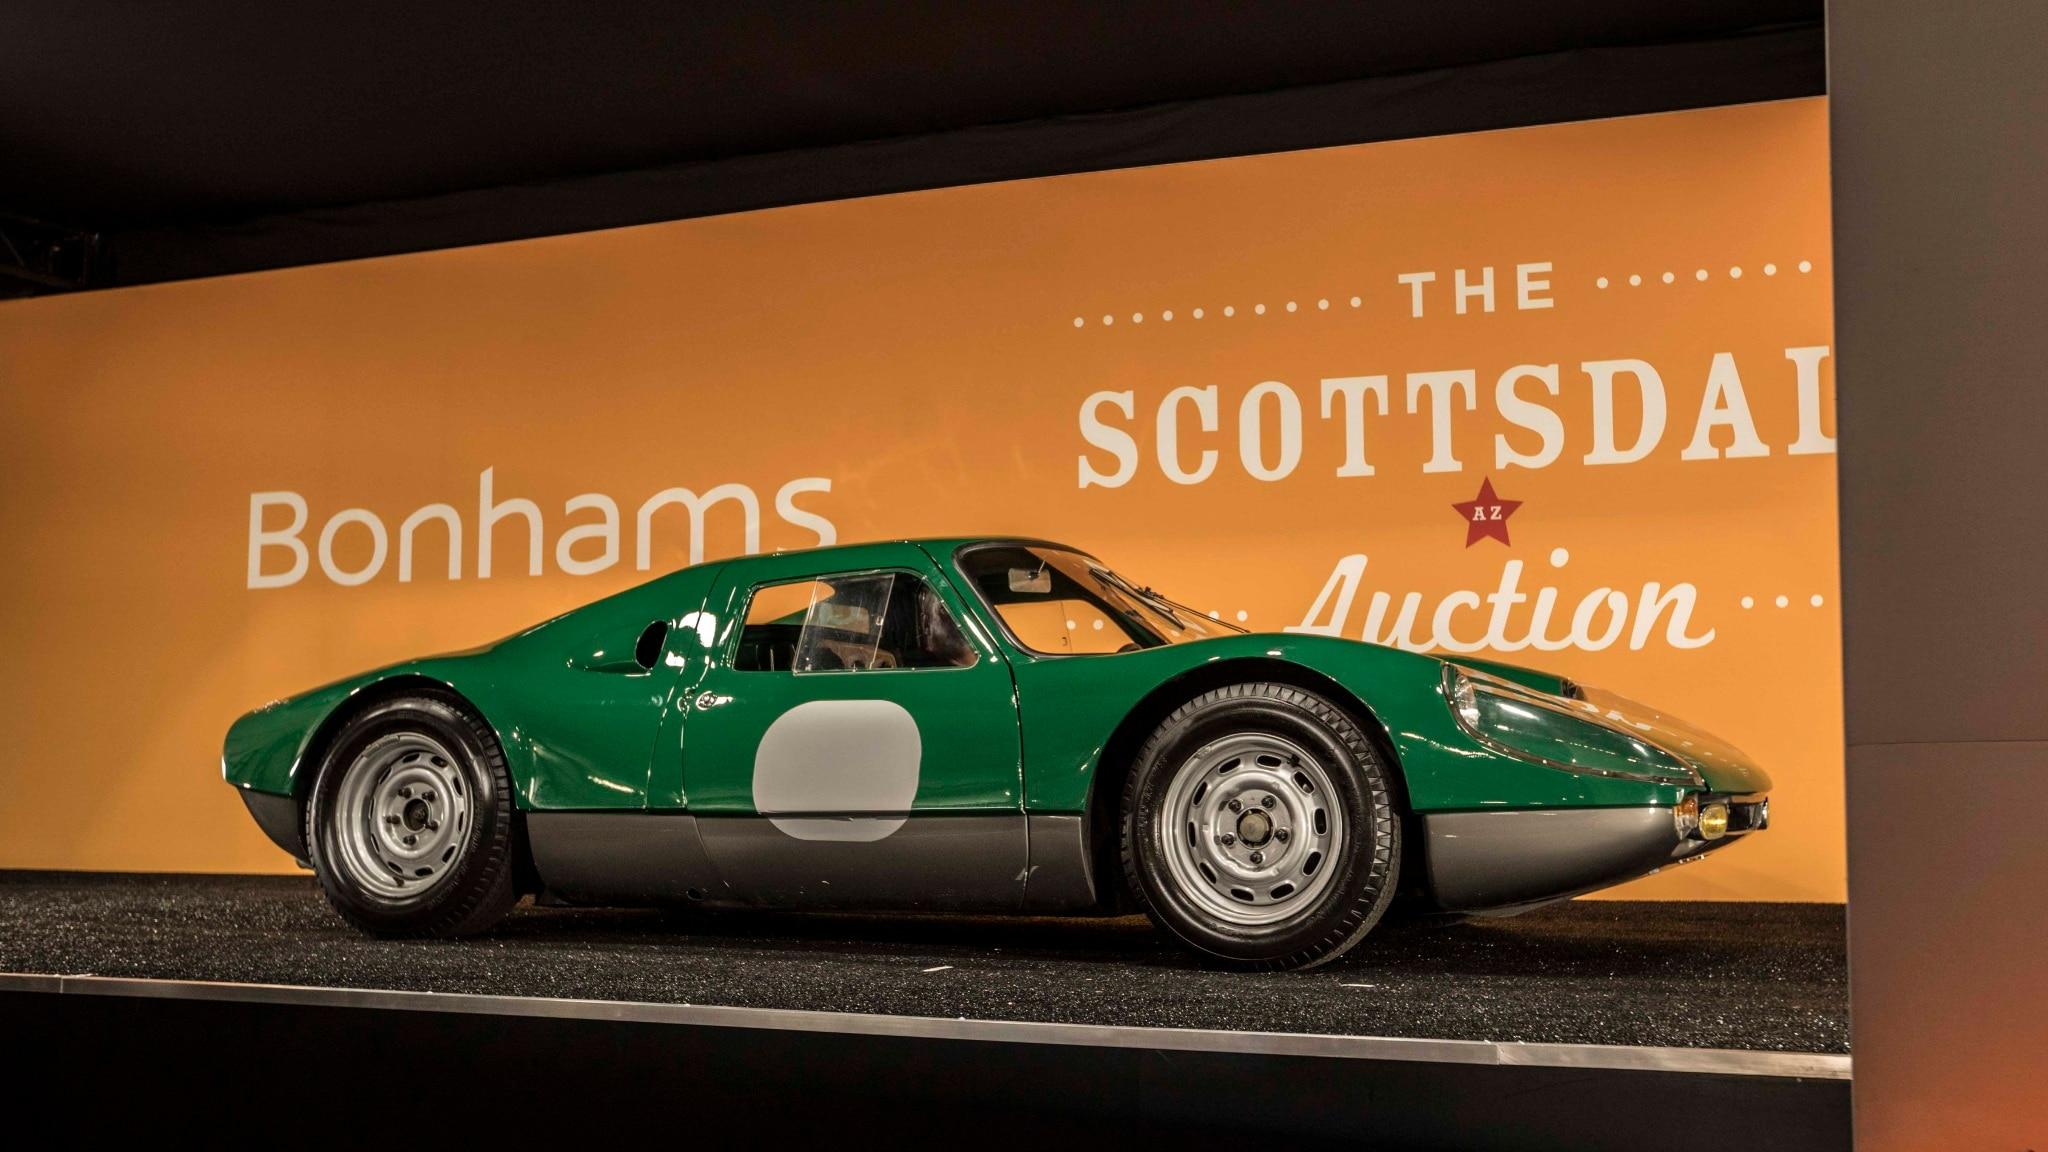 1964 Porsche 904 Gts Side